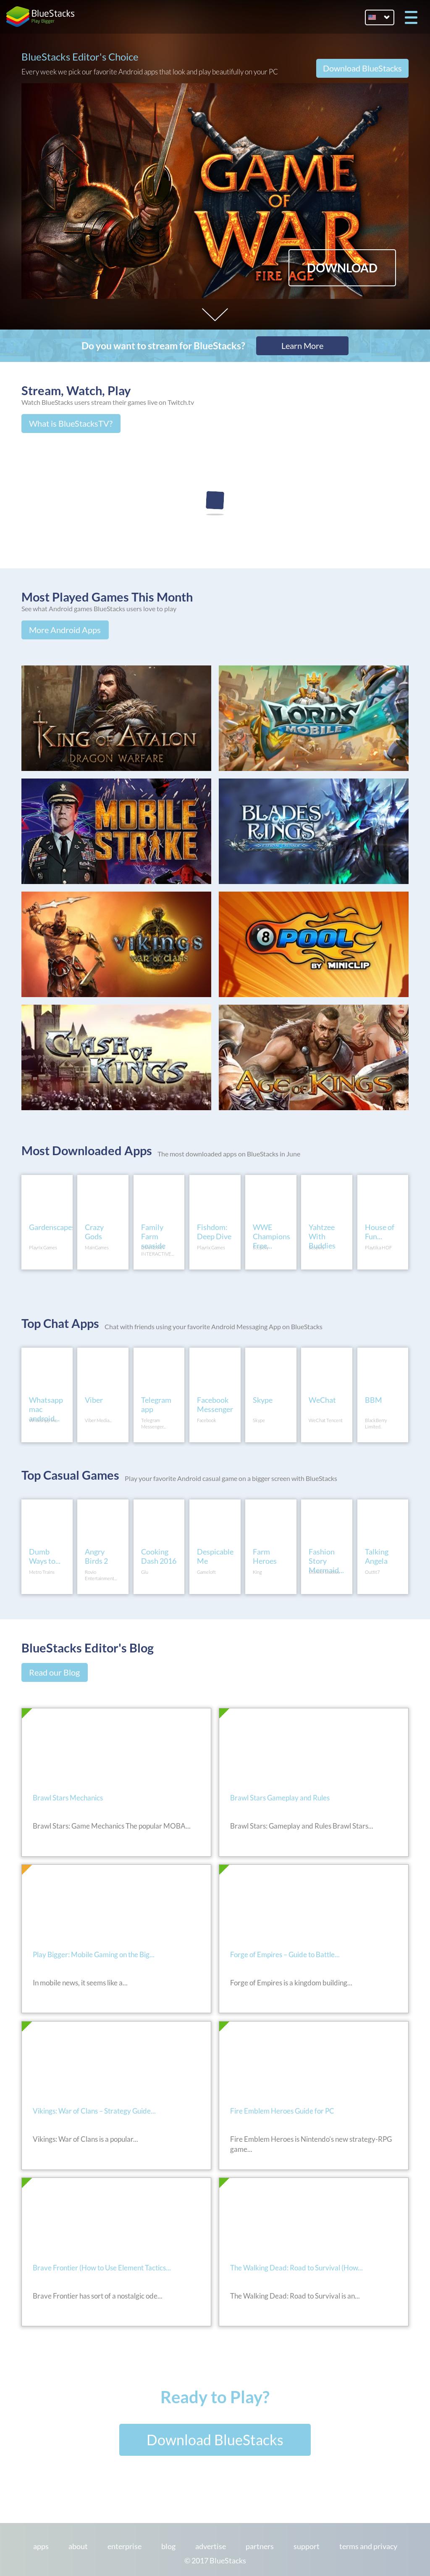 BlueStacks Competitors, Revenue and Employees - Owler Company Profile